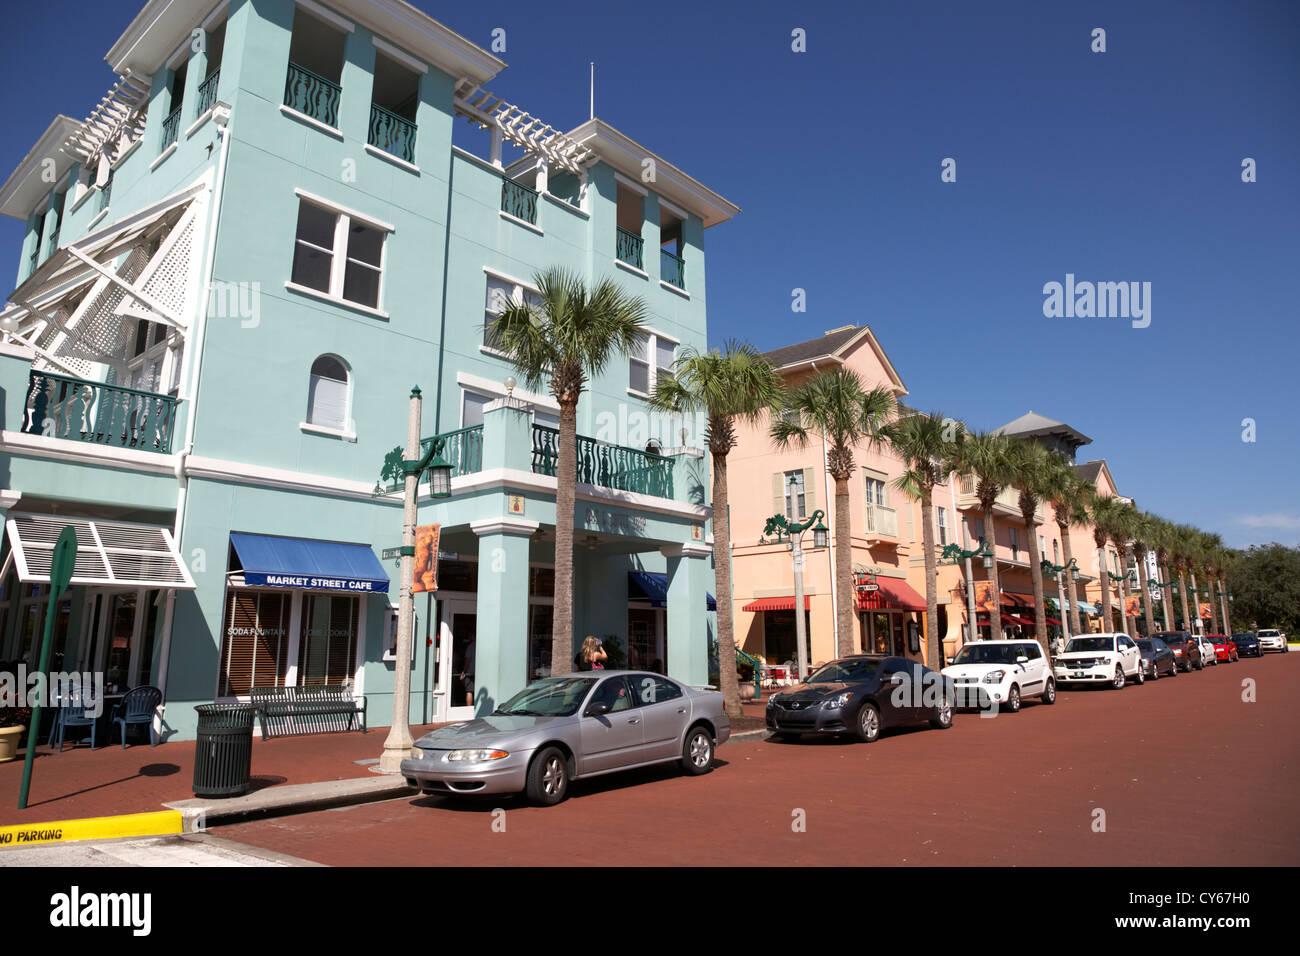 market street shops cafes and restaurants downtown celebration florida usa - Stock Image